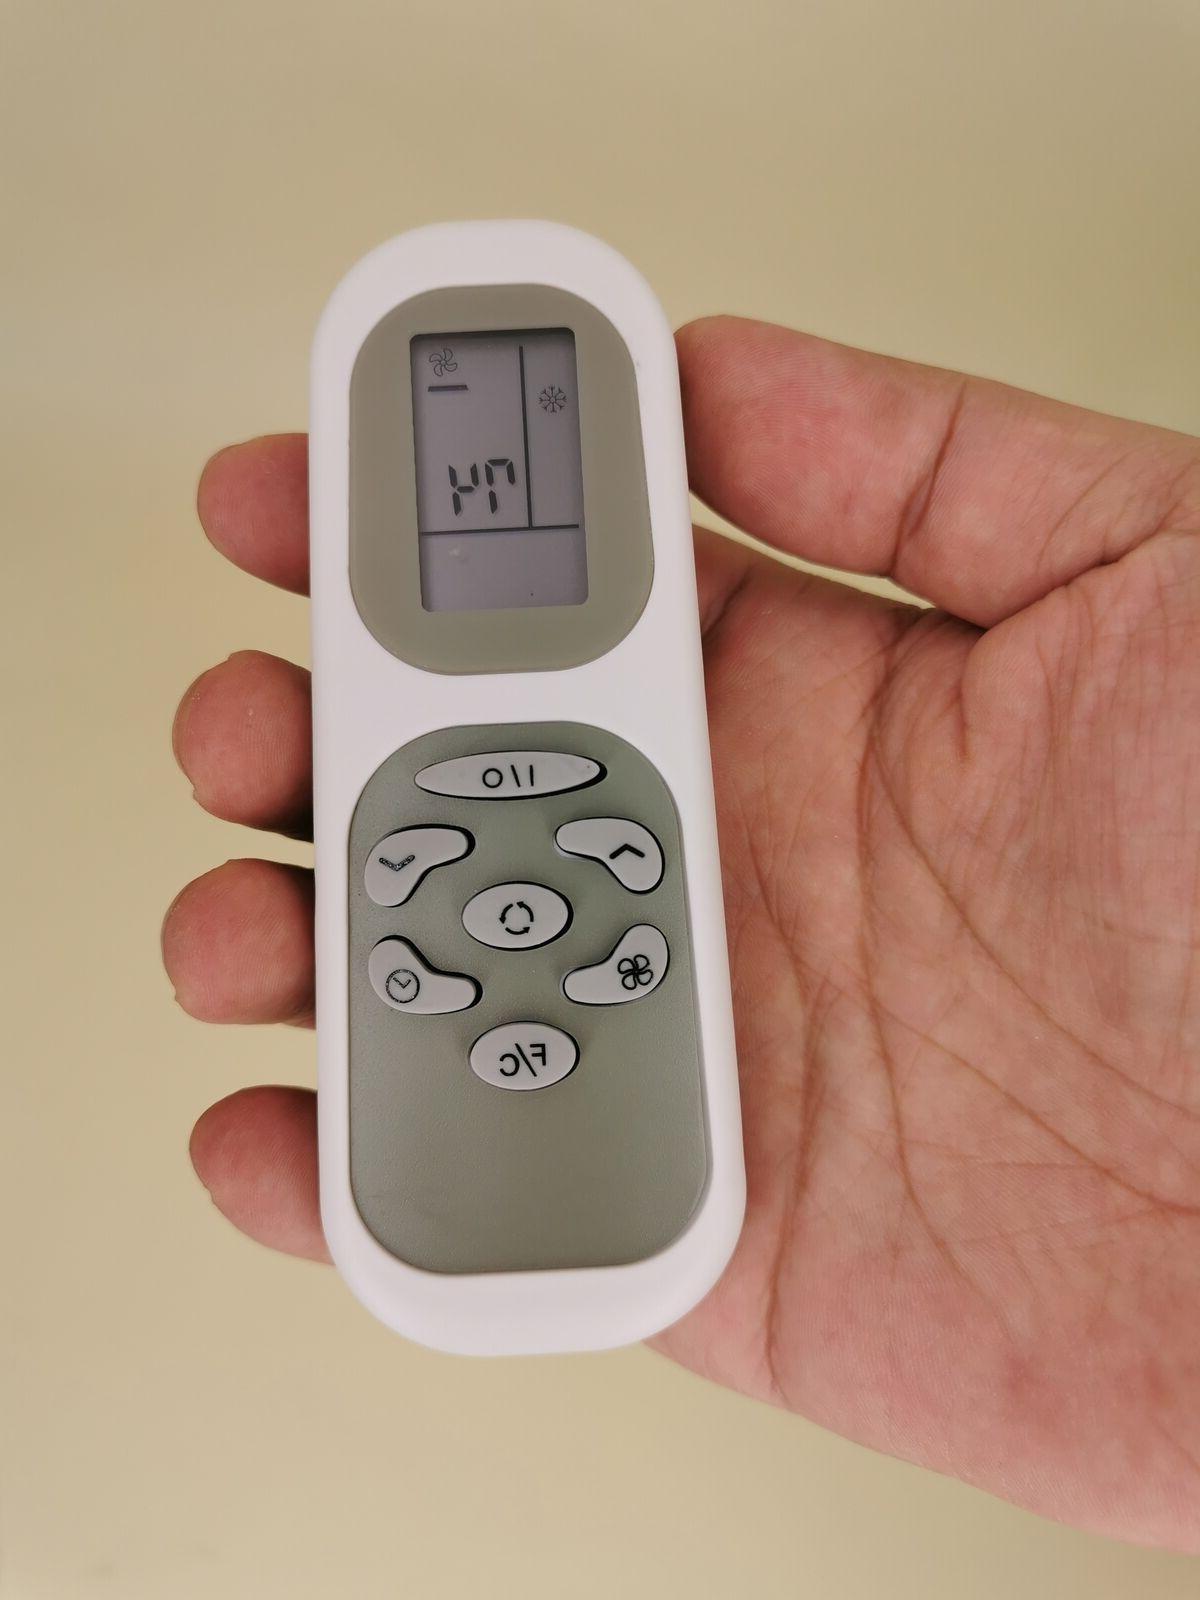 Second generation for Frigidaire Air Conditioner Remote Cont